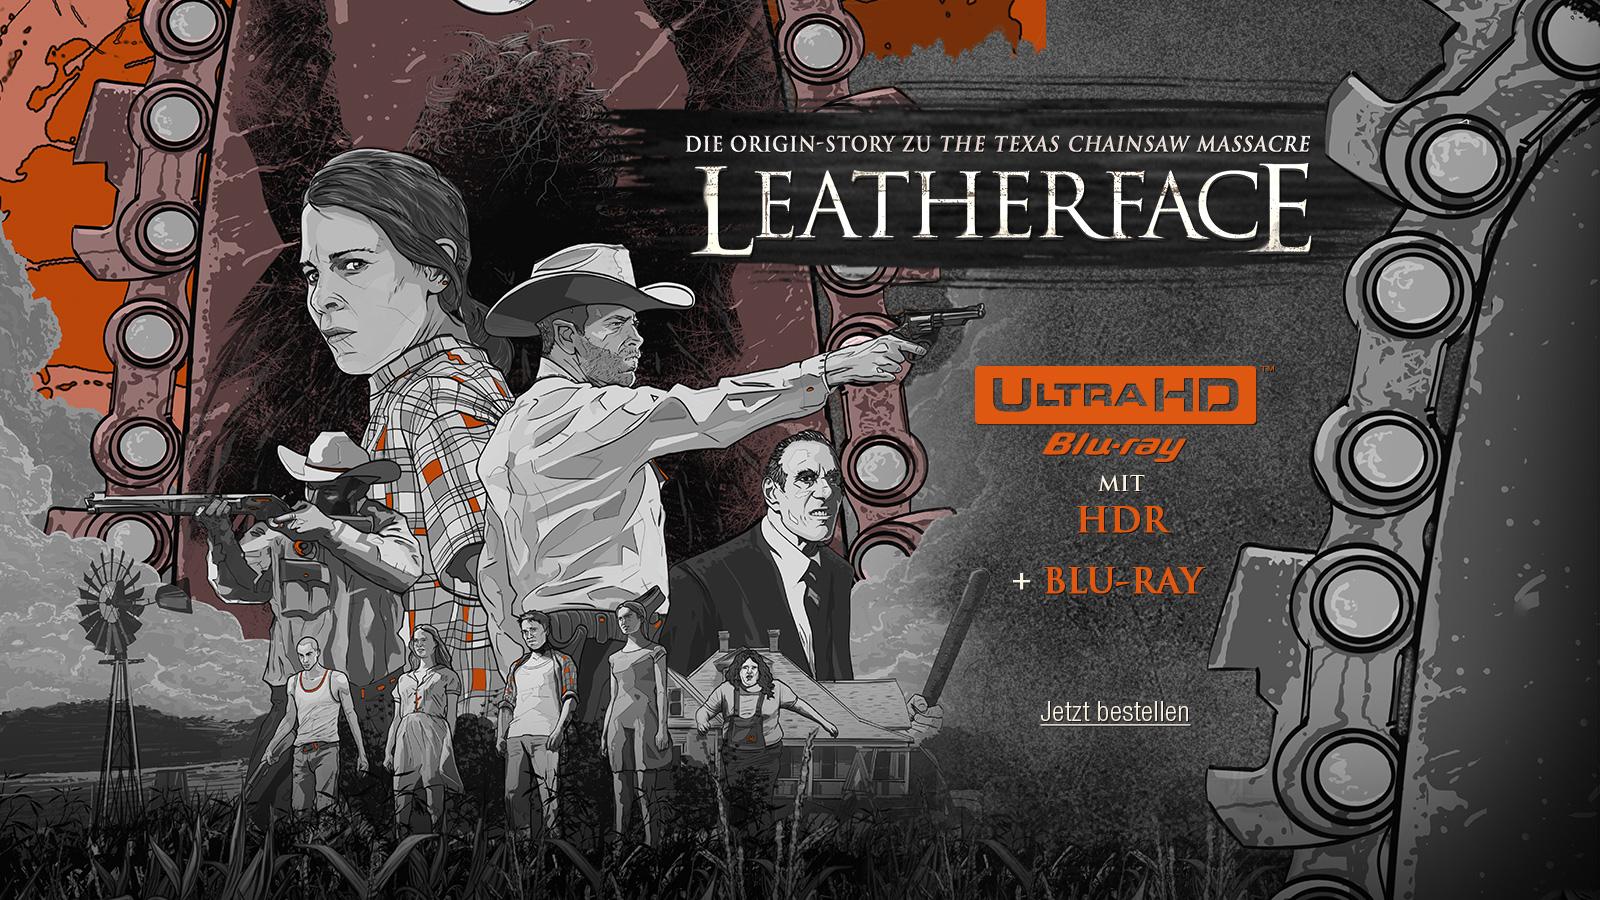 LeatherfaceUHD_TurbineHomepage_1600x900